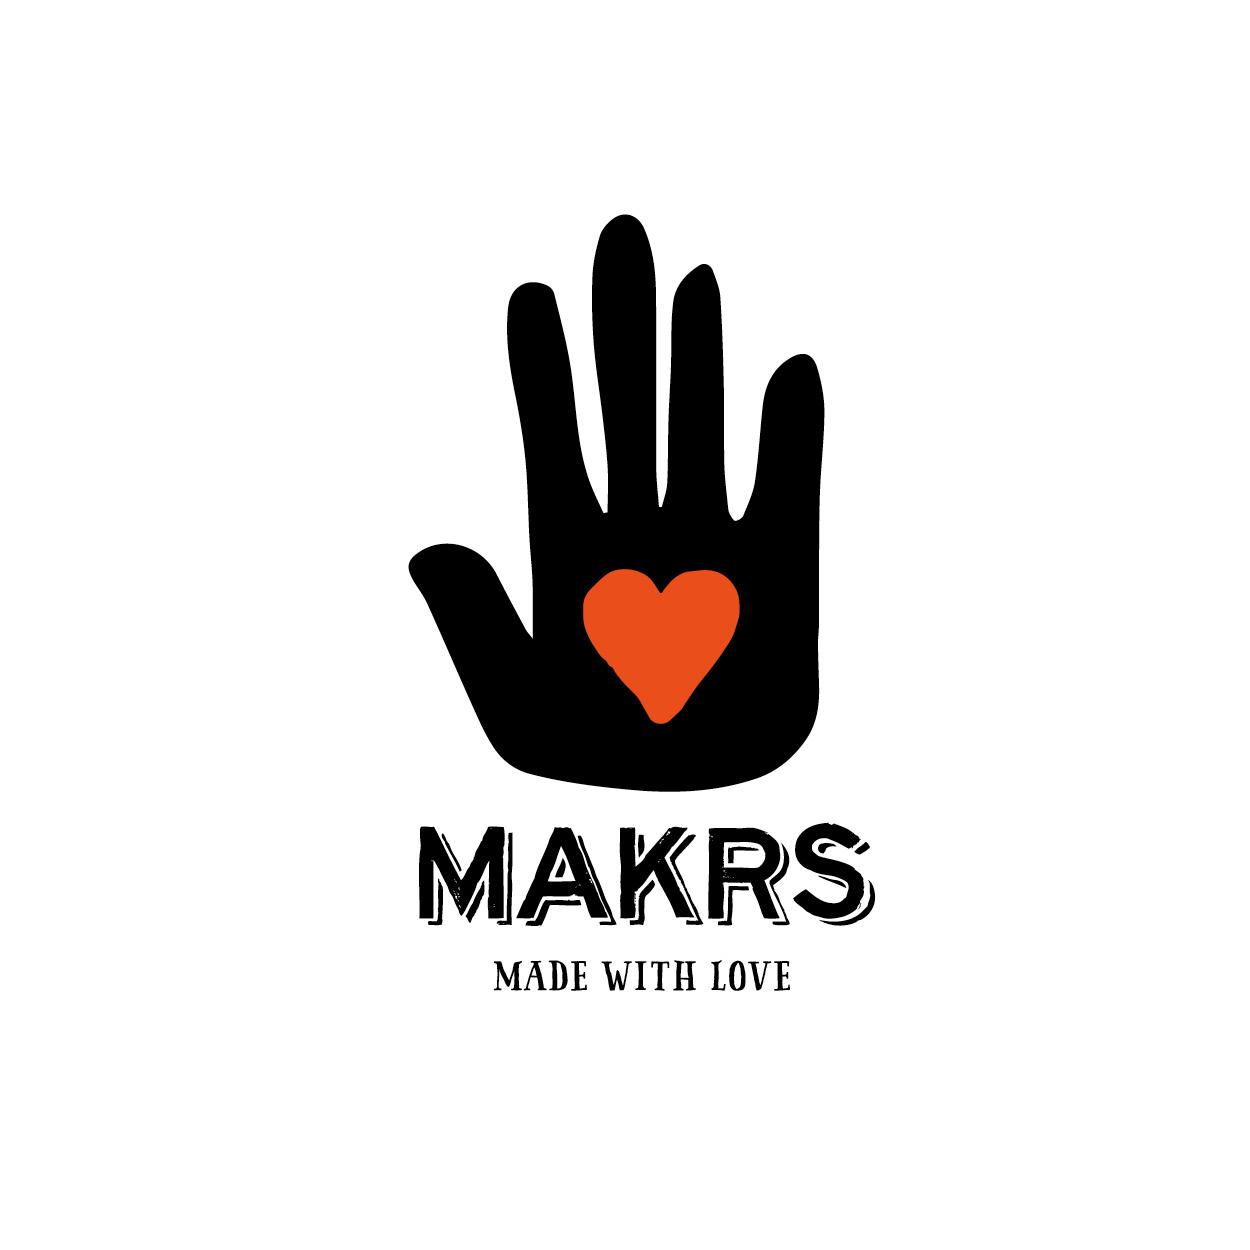 MAKRS